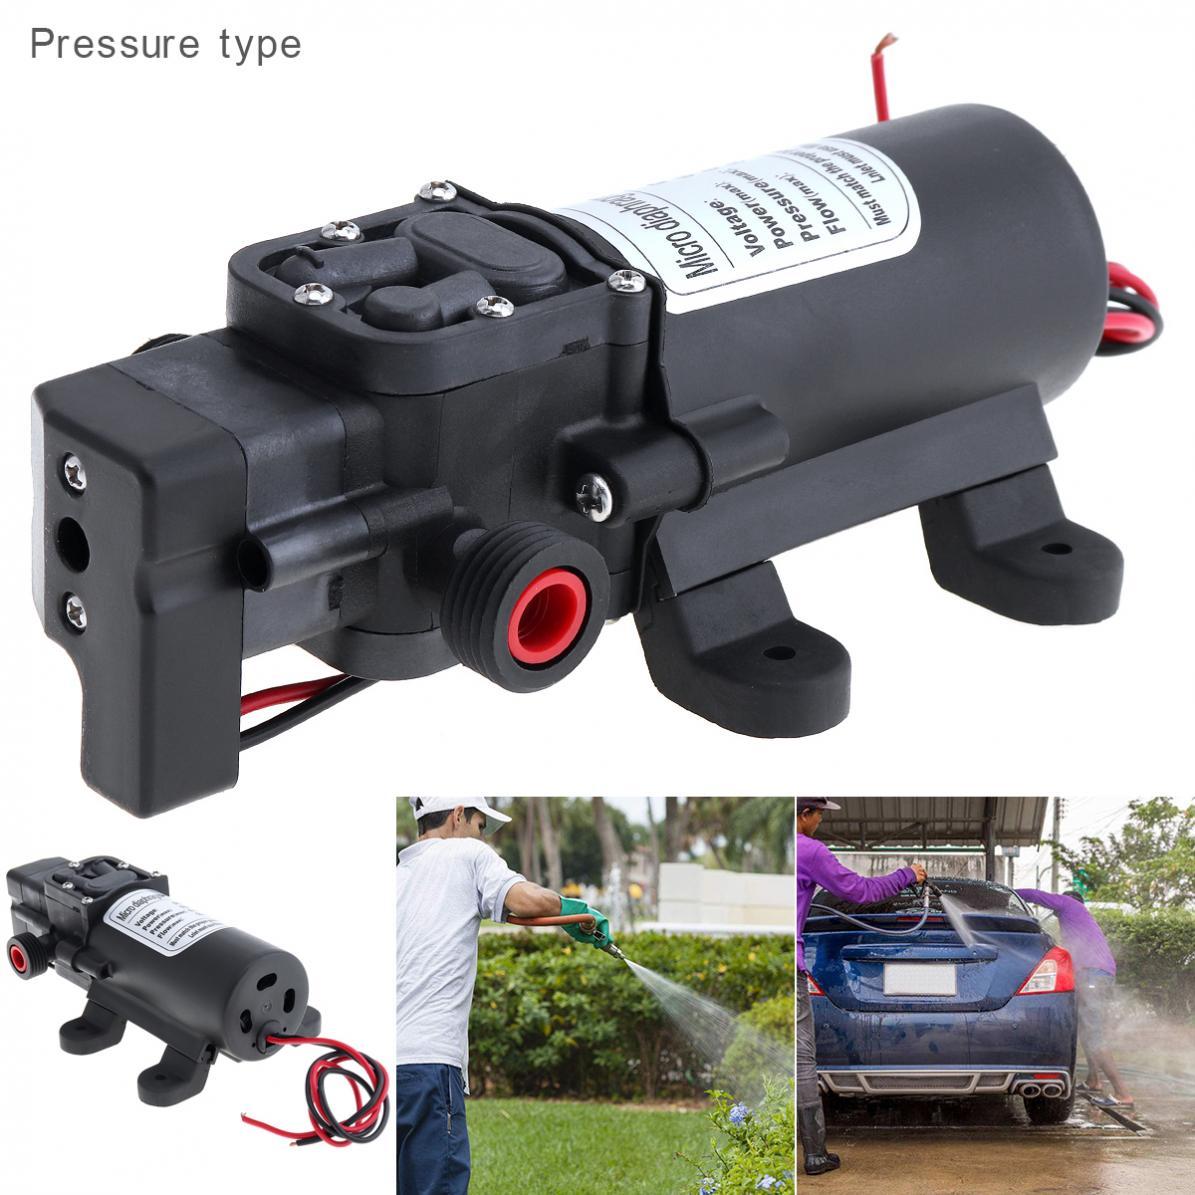 12V 60W Durable 5L/min Self-suction DC Intelligent Mini Diaphragm High Pressure Electric Car Wash Pump For Car / Home / Garden